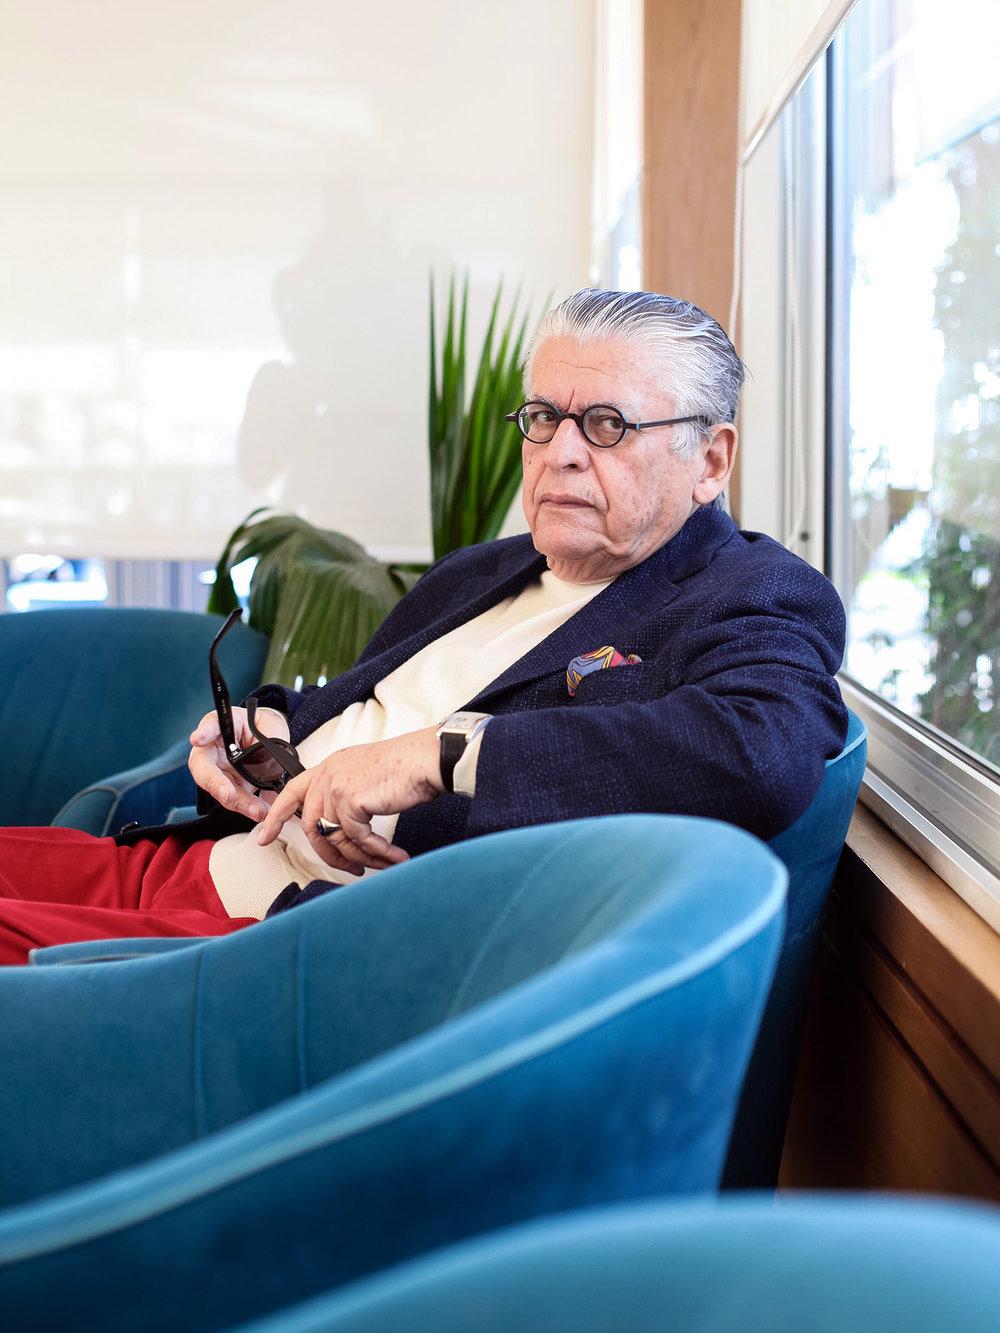 Youssef Zarrouk, Tunisian Business man, For the Globe and Mail. December 2017. Sidi Bou Saïd. Tunisia